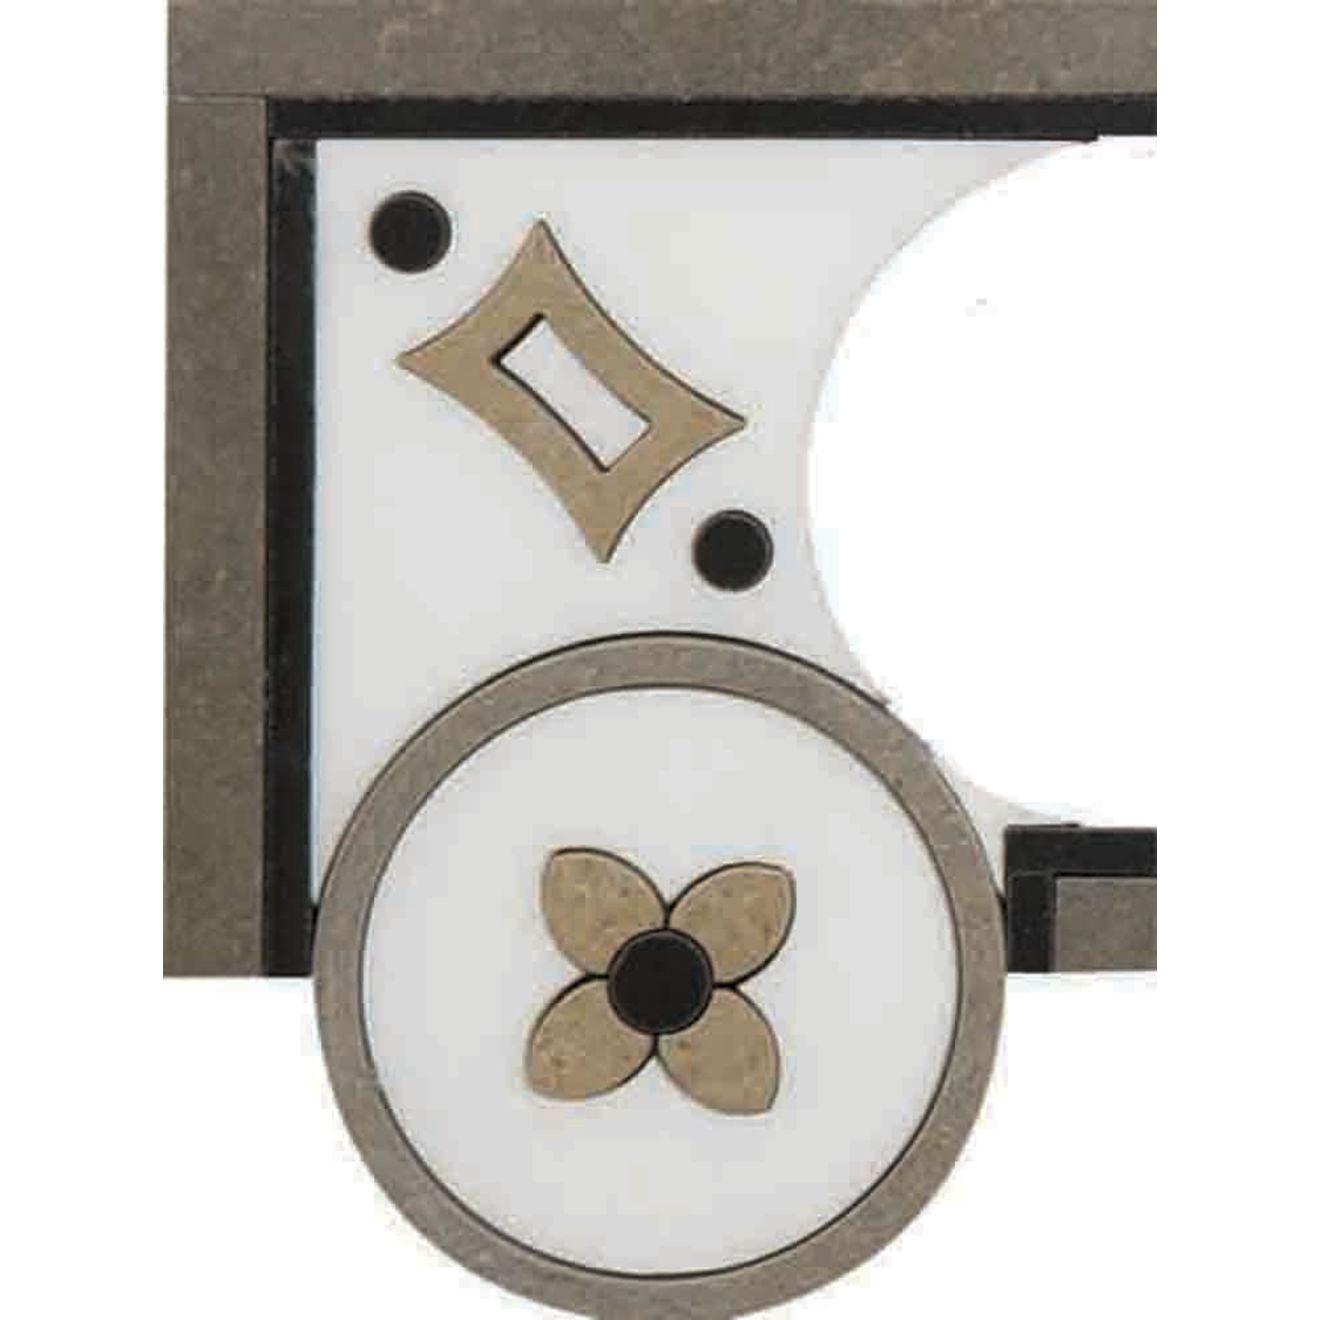 "Suave 4"" x 4"" Decorative Tile in Calacatta, Gold, Nero, Sable"